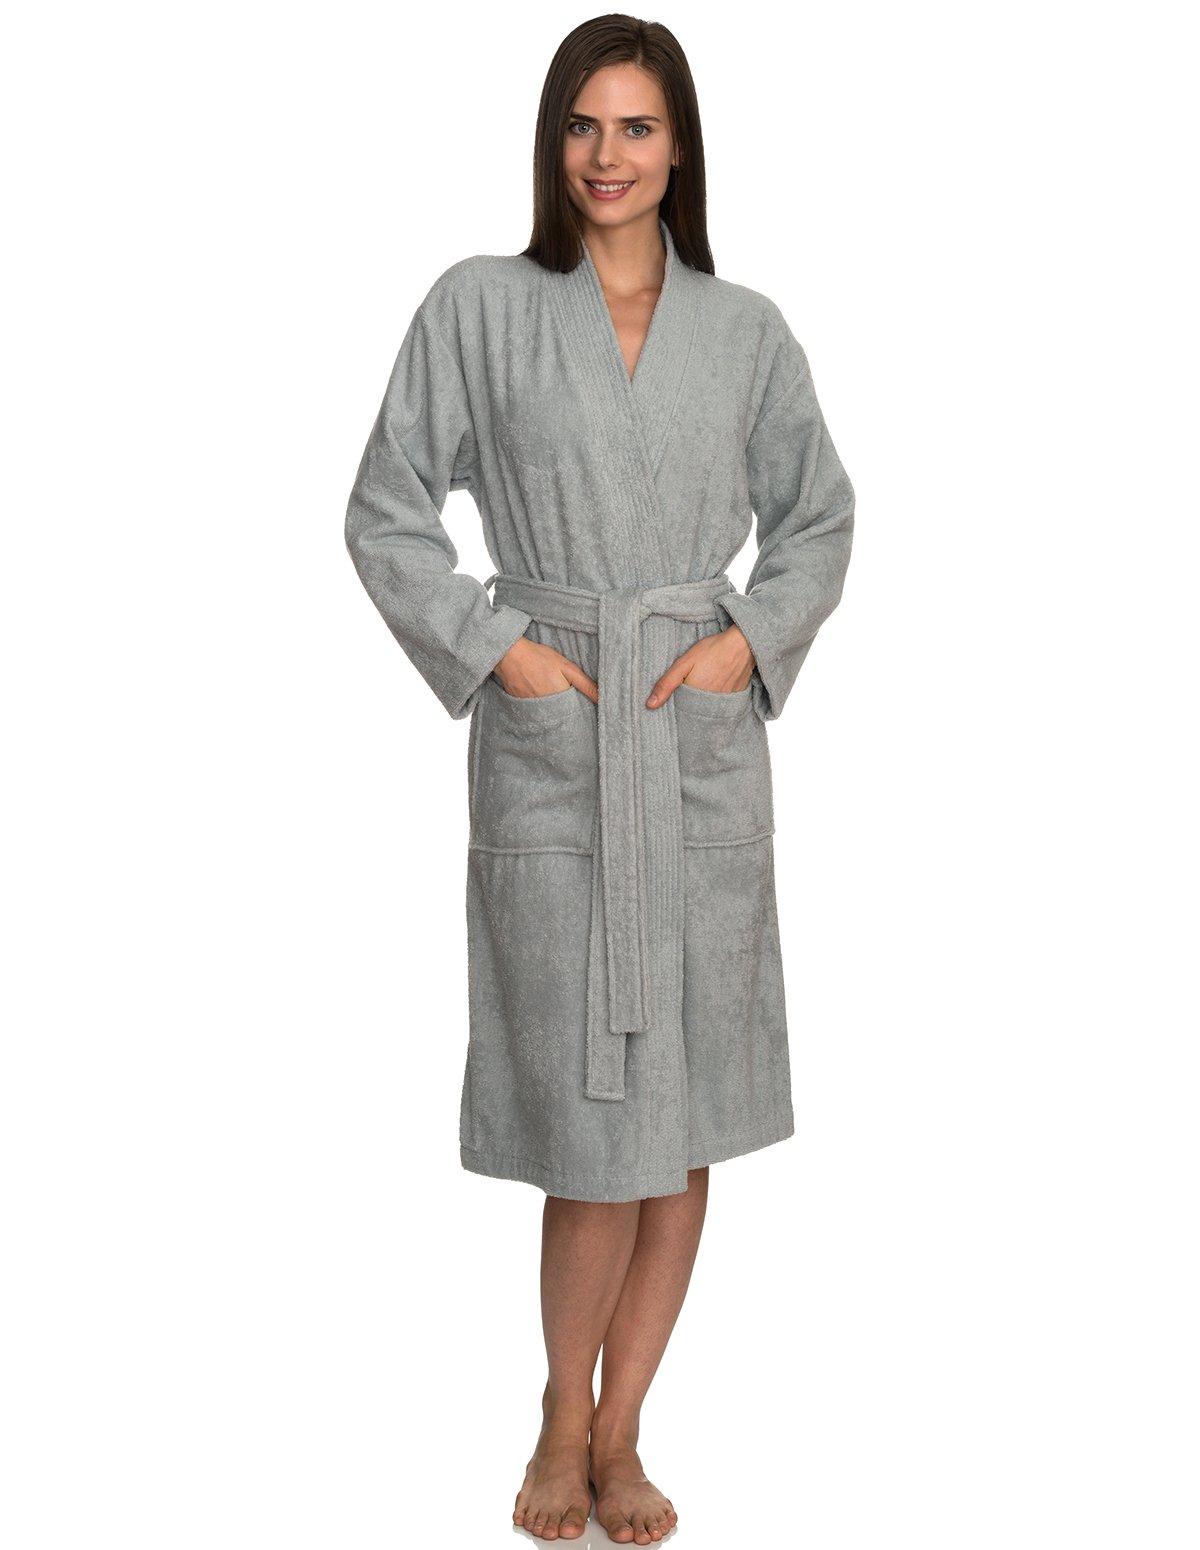 TowelSelections Women's Robe Turkish Cotton Terry Kimono Bathrobe Small/Medium High-Rise